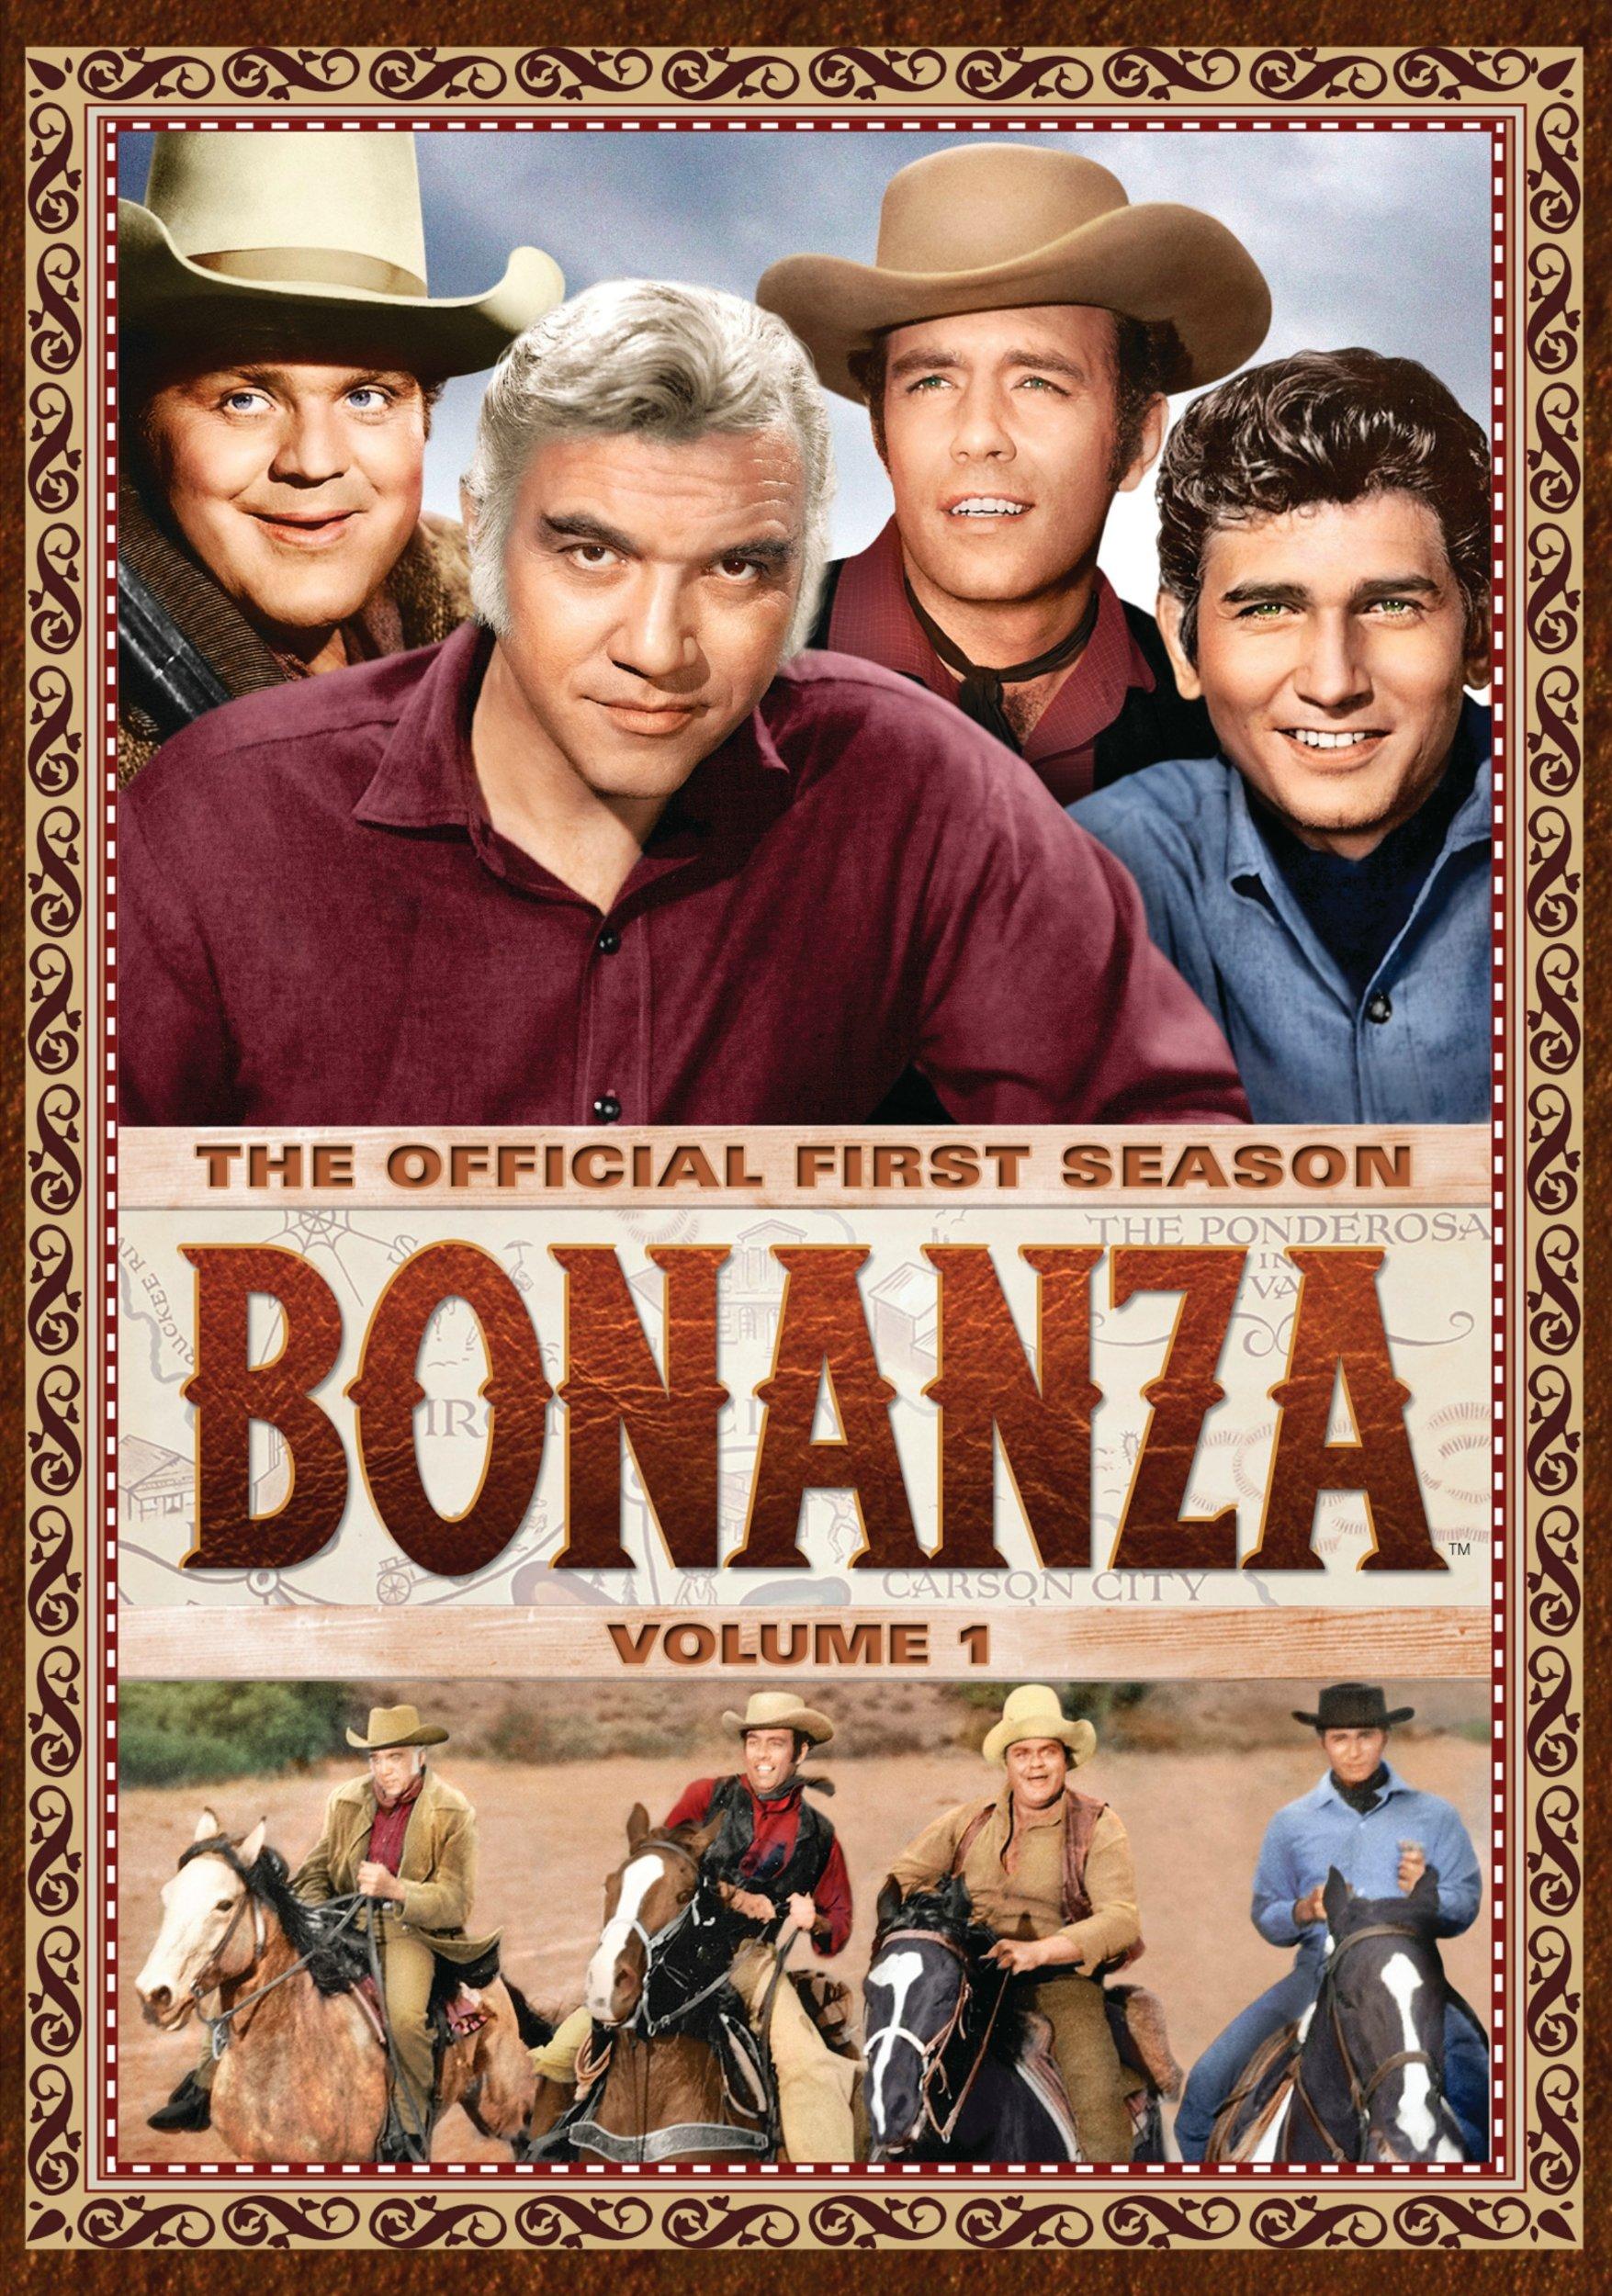 Bonanza: The Official First Season, Vol. One